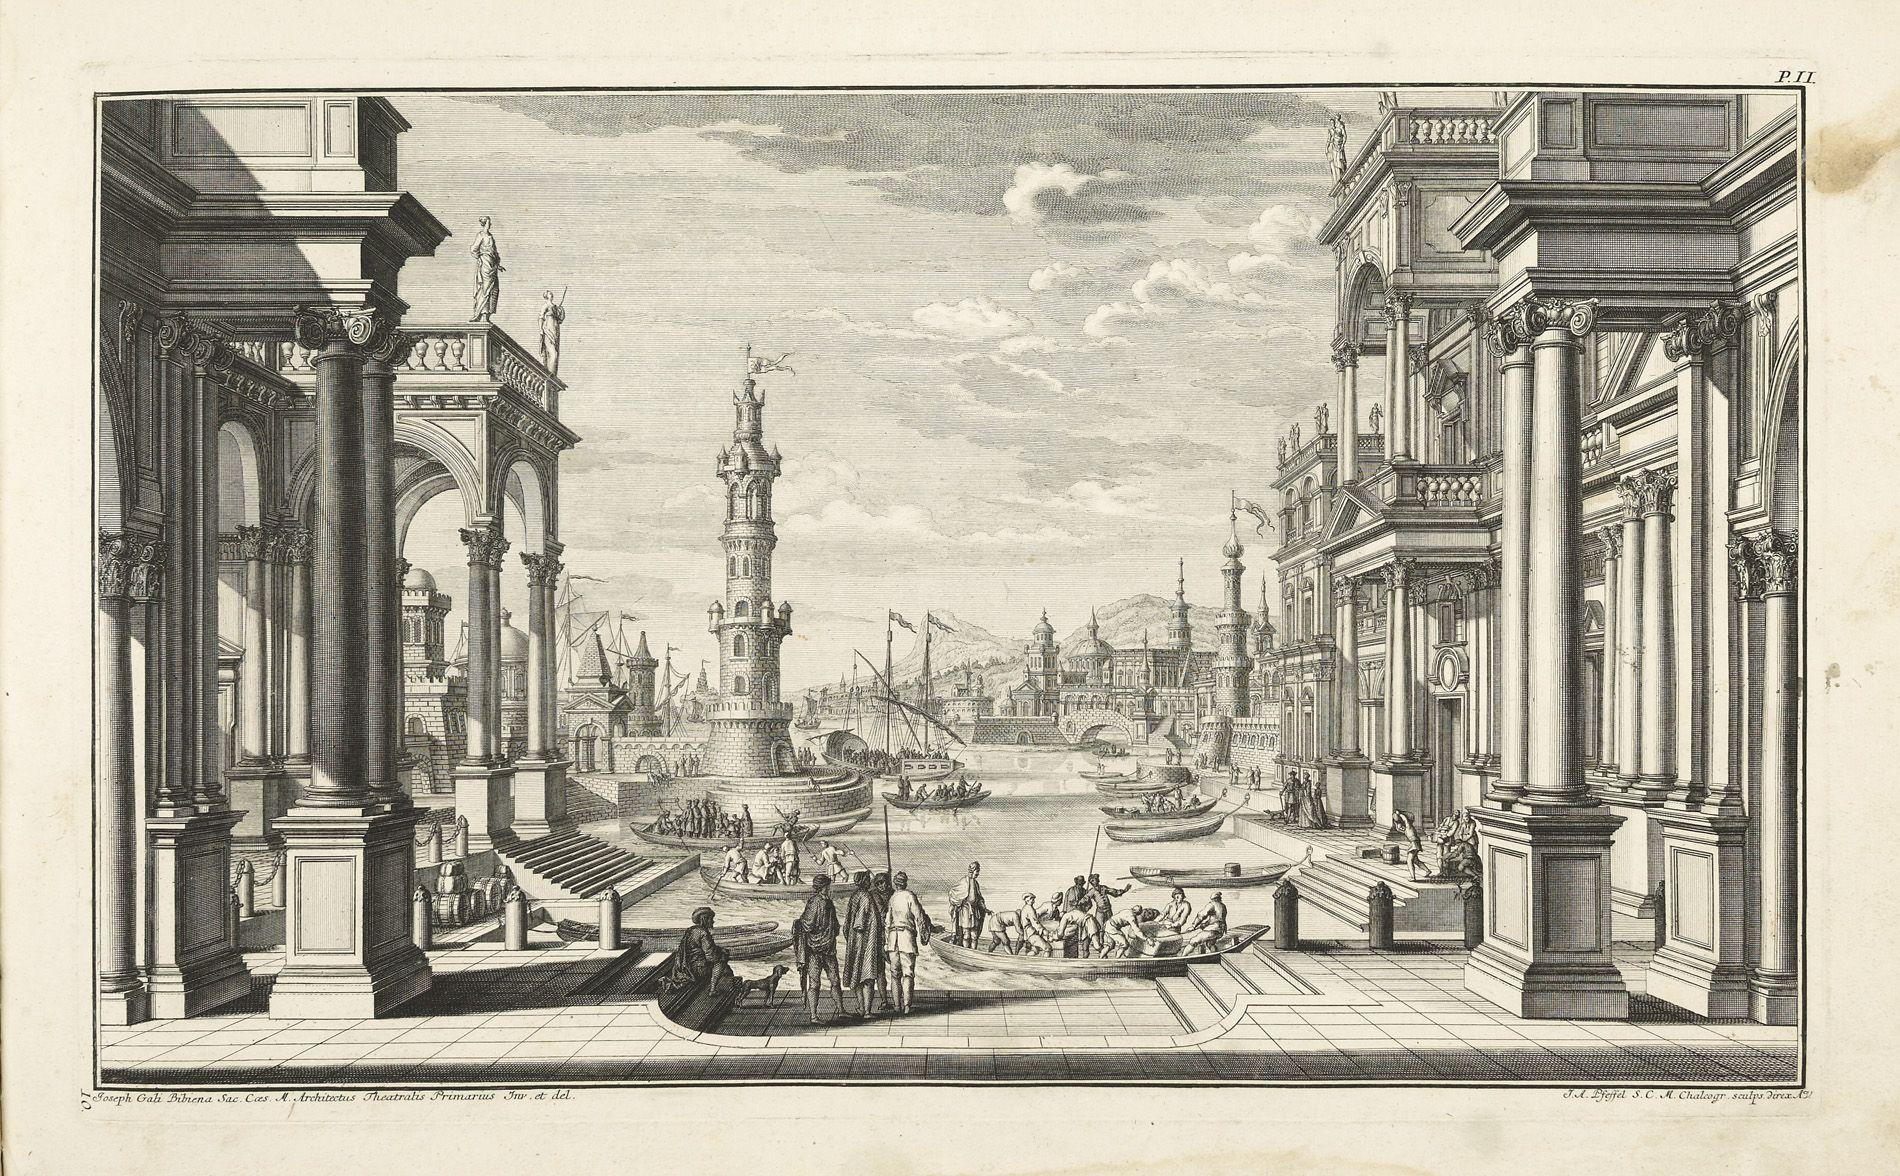 Galli da Bibiena, Giuseppe | £1,000 - 1,500